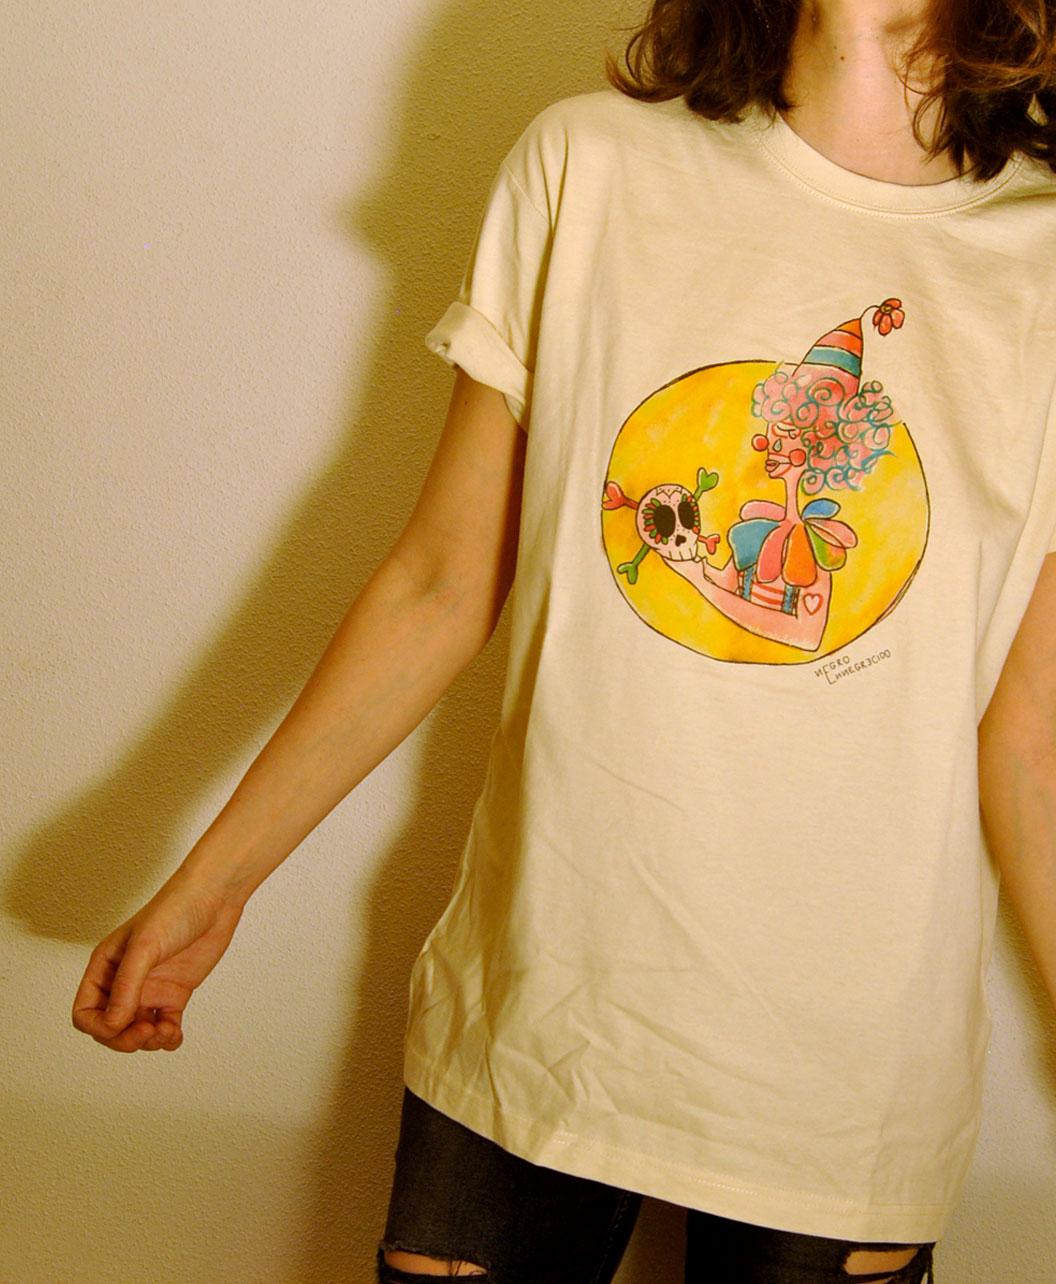 camiseta manga corta adulto unisex original diferente sad payaso